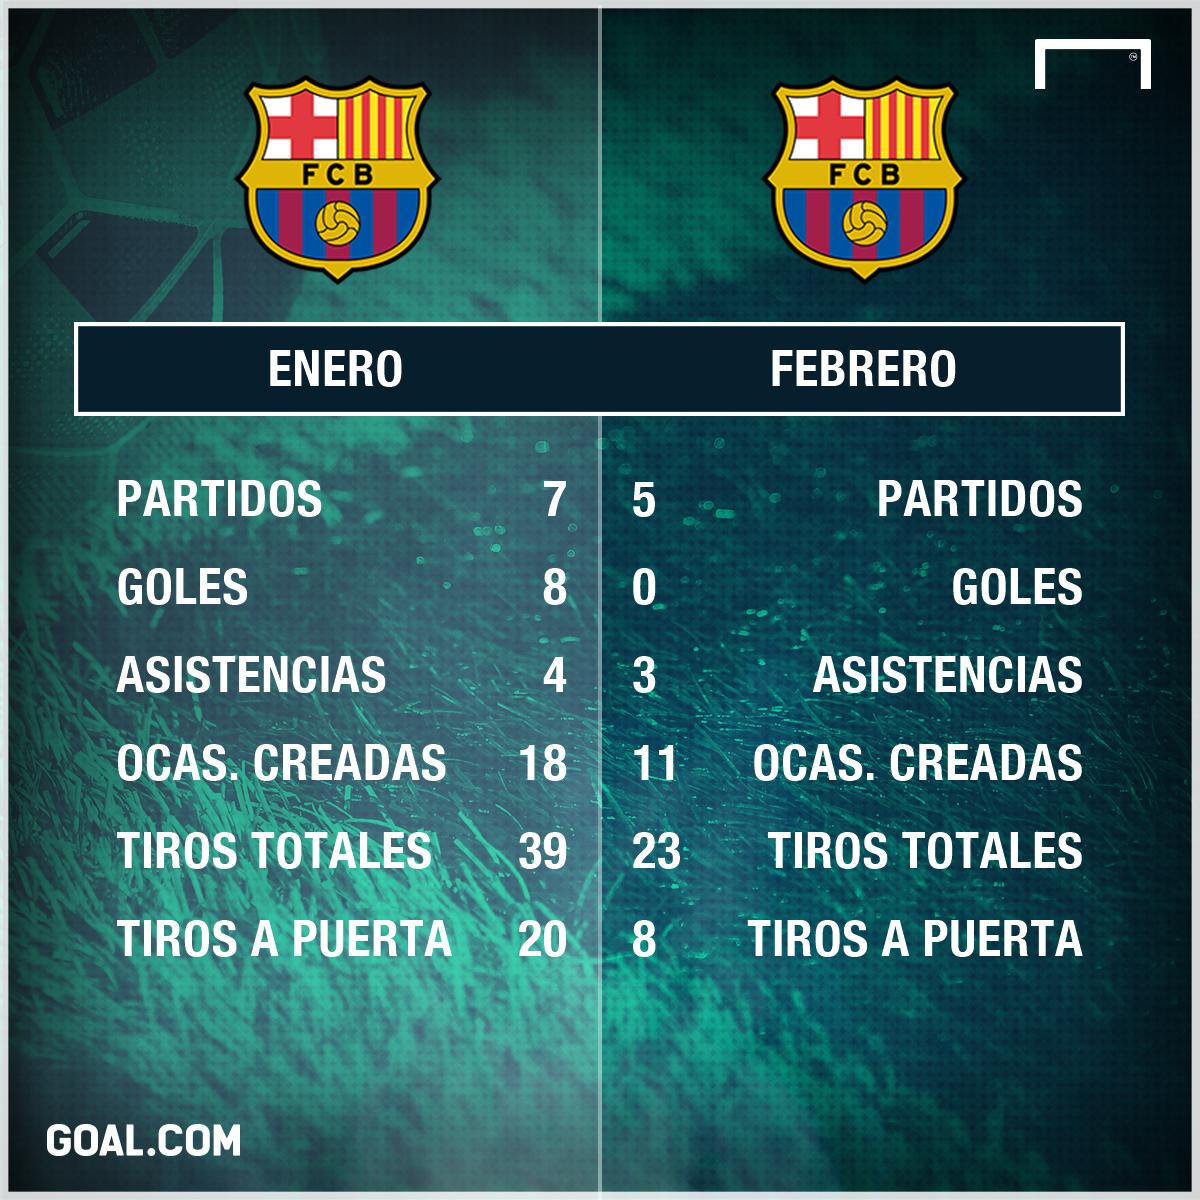 Febrero Messi